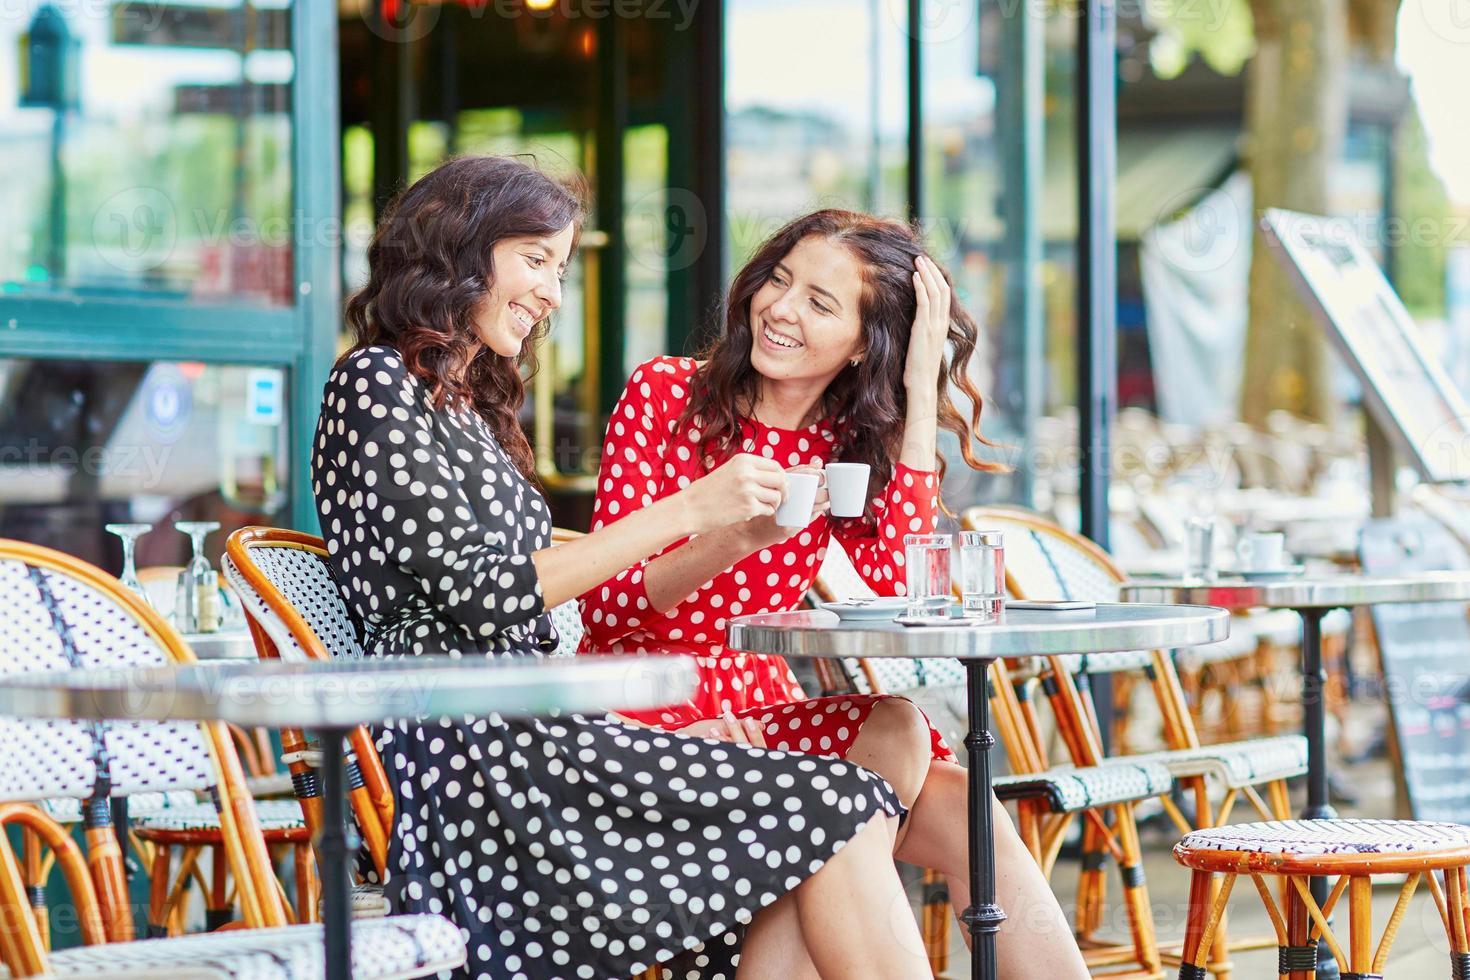 hermosas hermanas gemelas tomando café foto